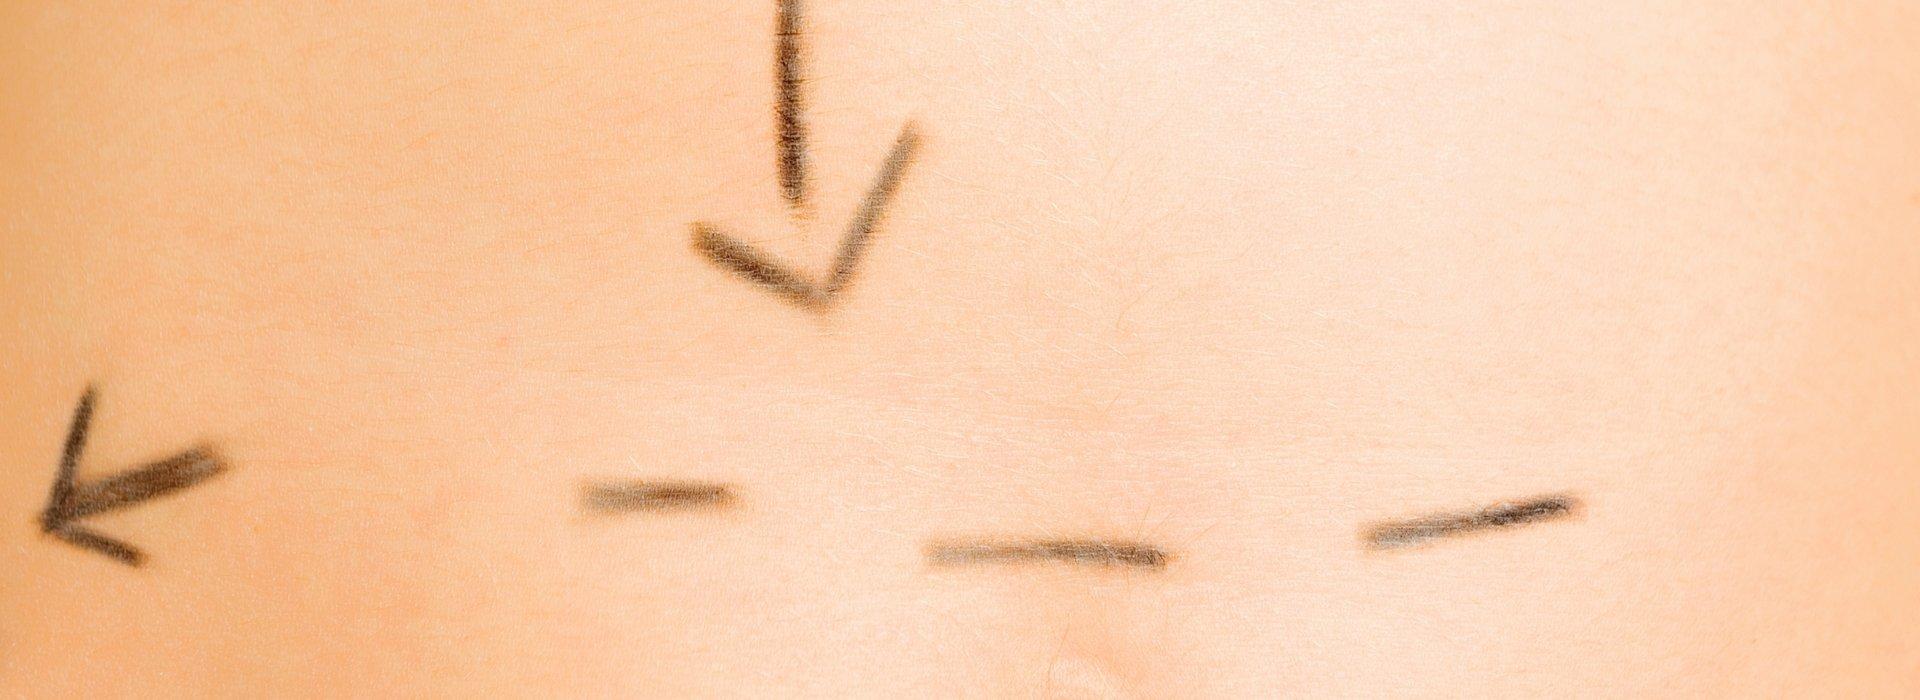 Hautkorrektur